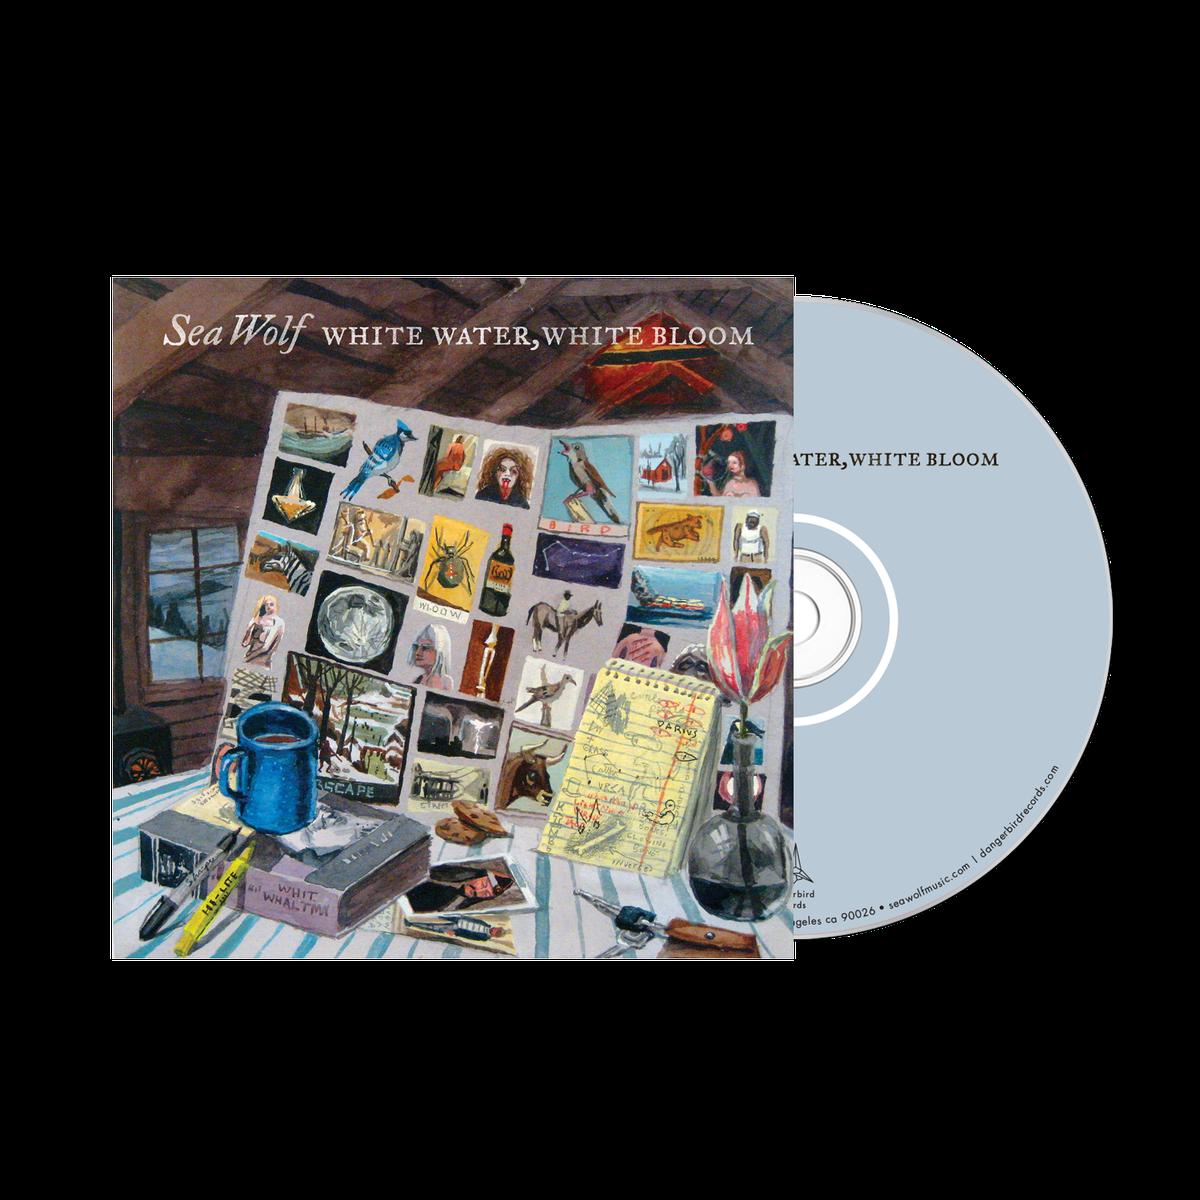 Sea Wolf - White Water, White Bloom - CD